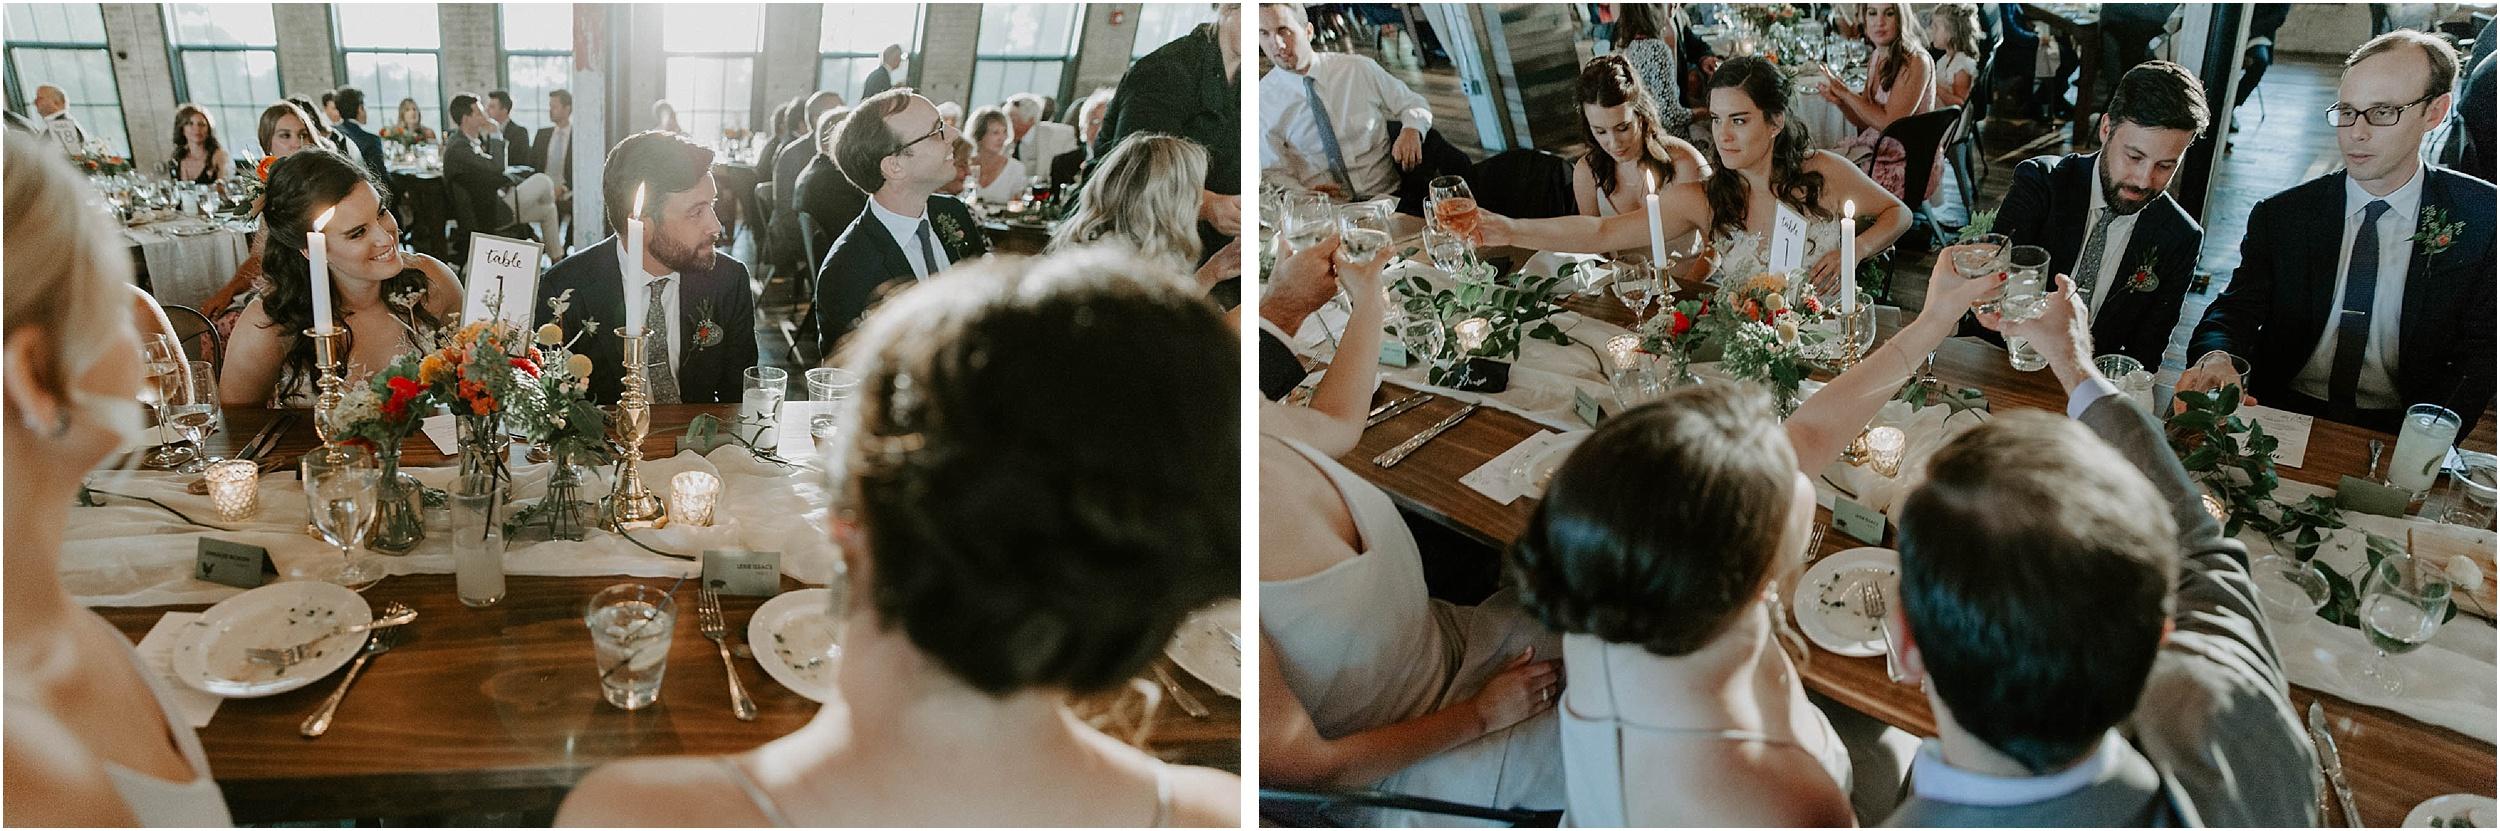 journeyman_distillery_wedding_photographer_chicago_il_wright_photographs-6963.jpg